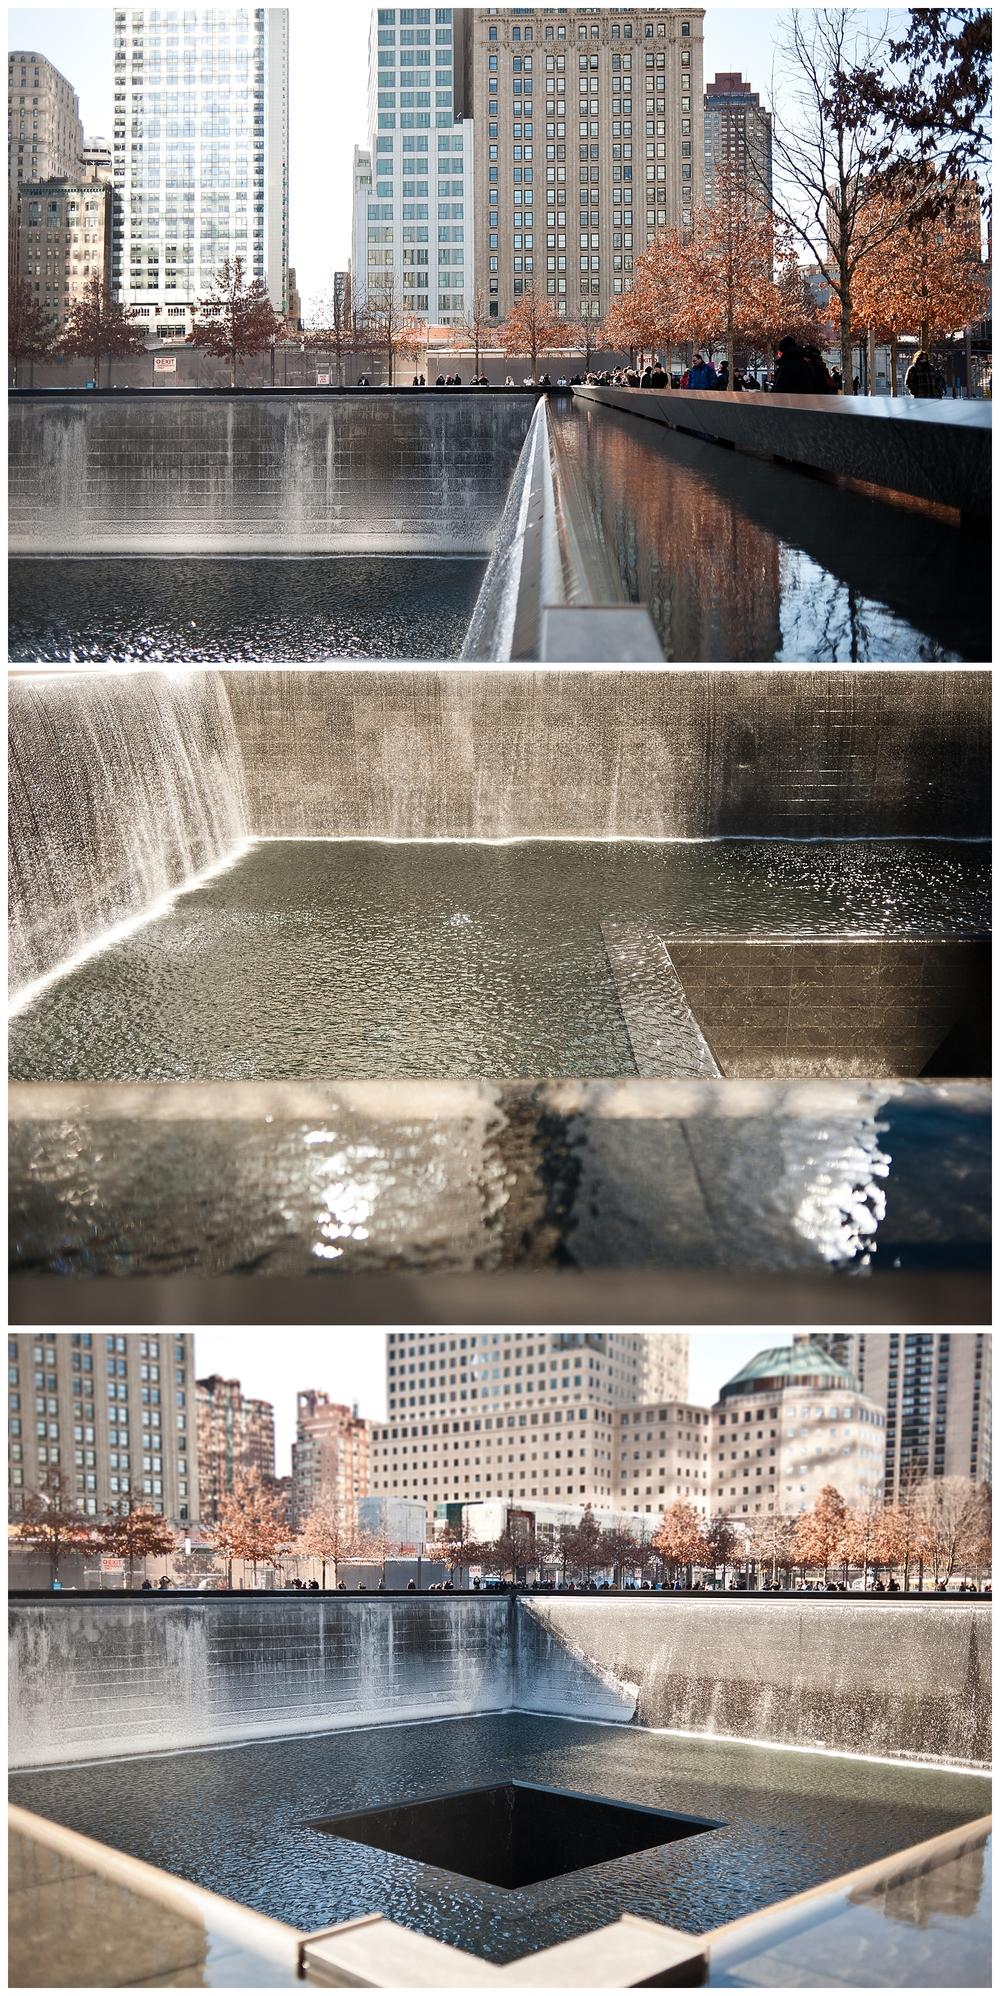 NYC_Part2_Touring_0007.jpg